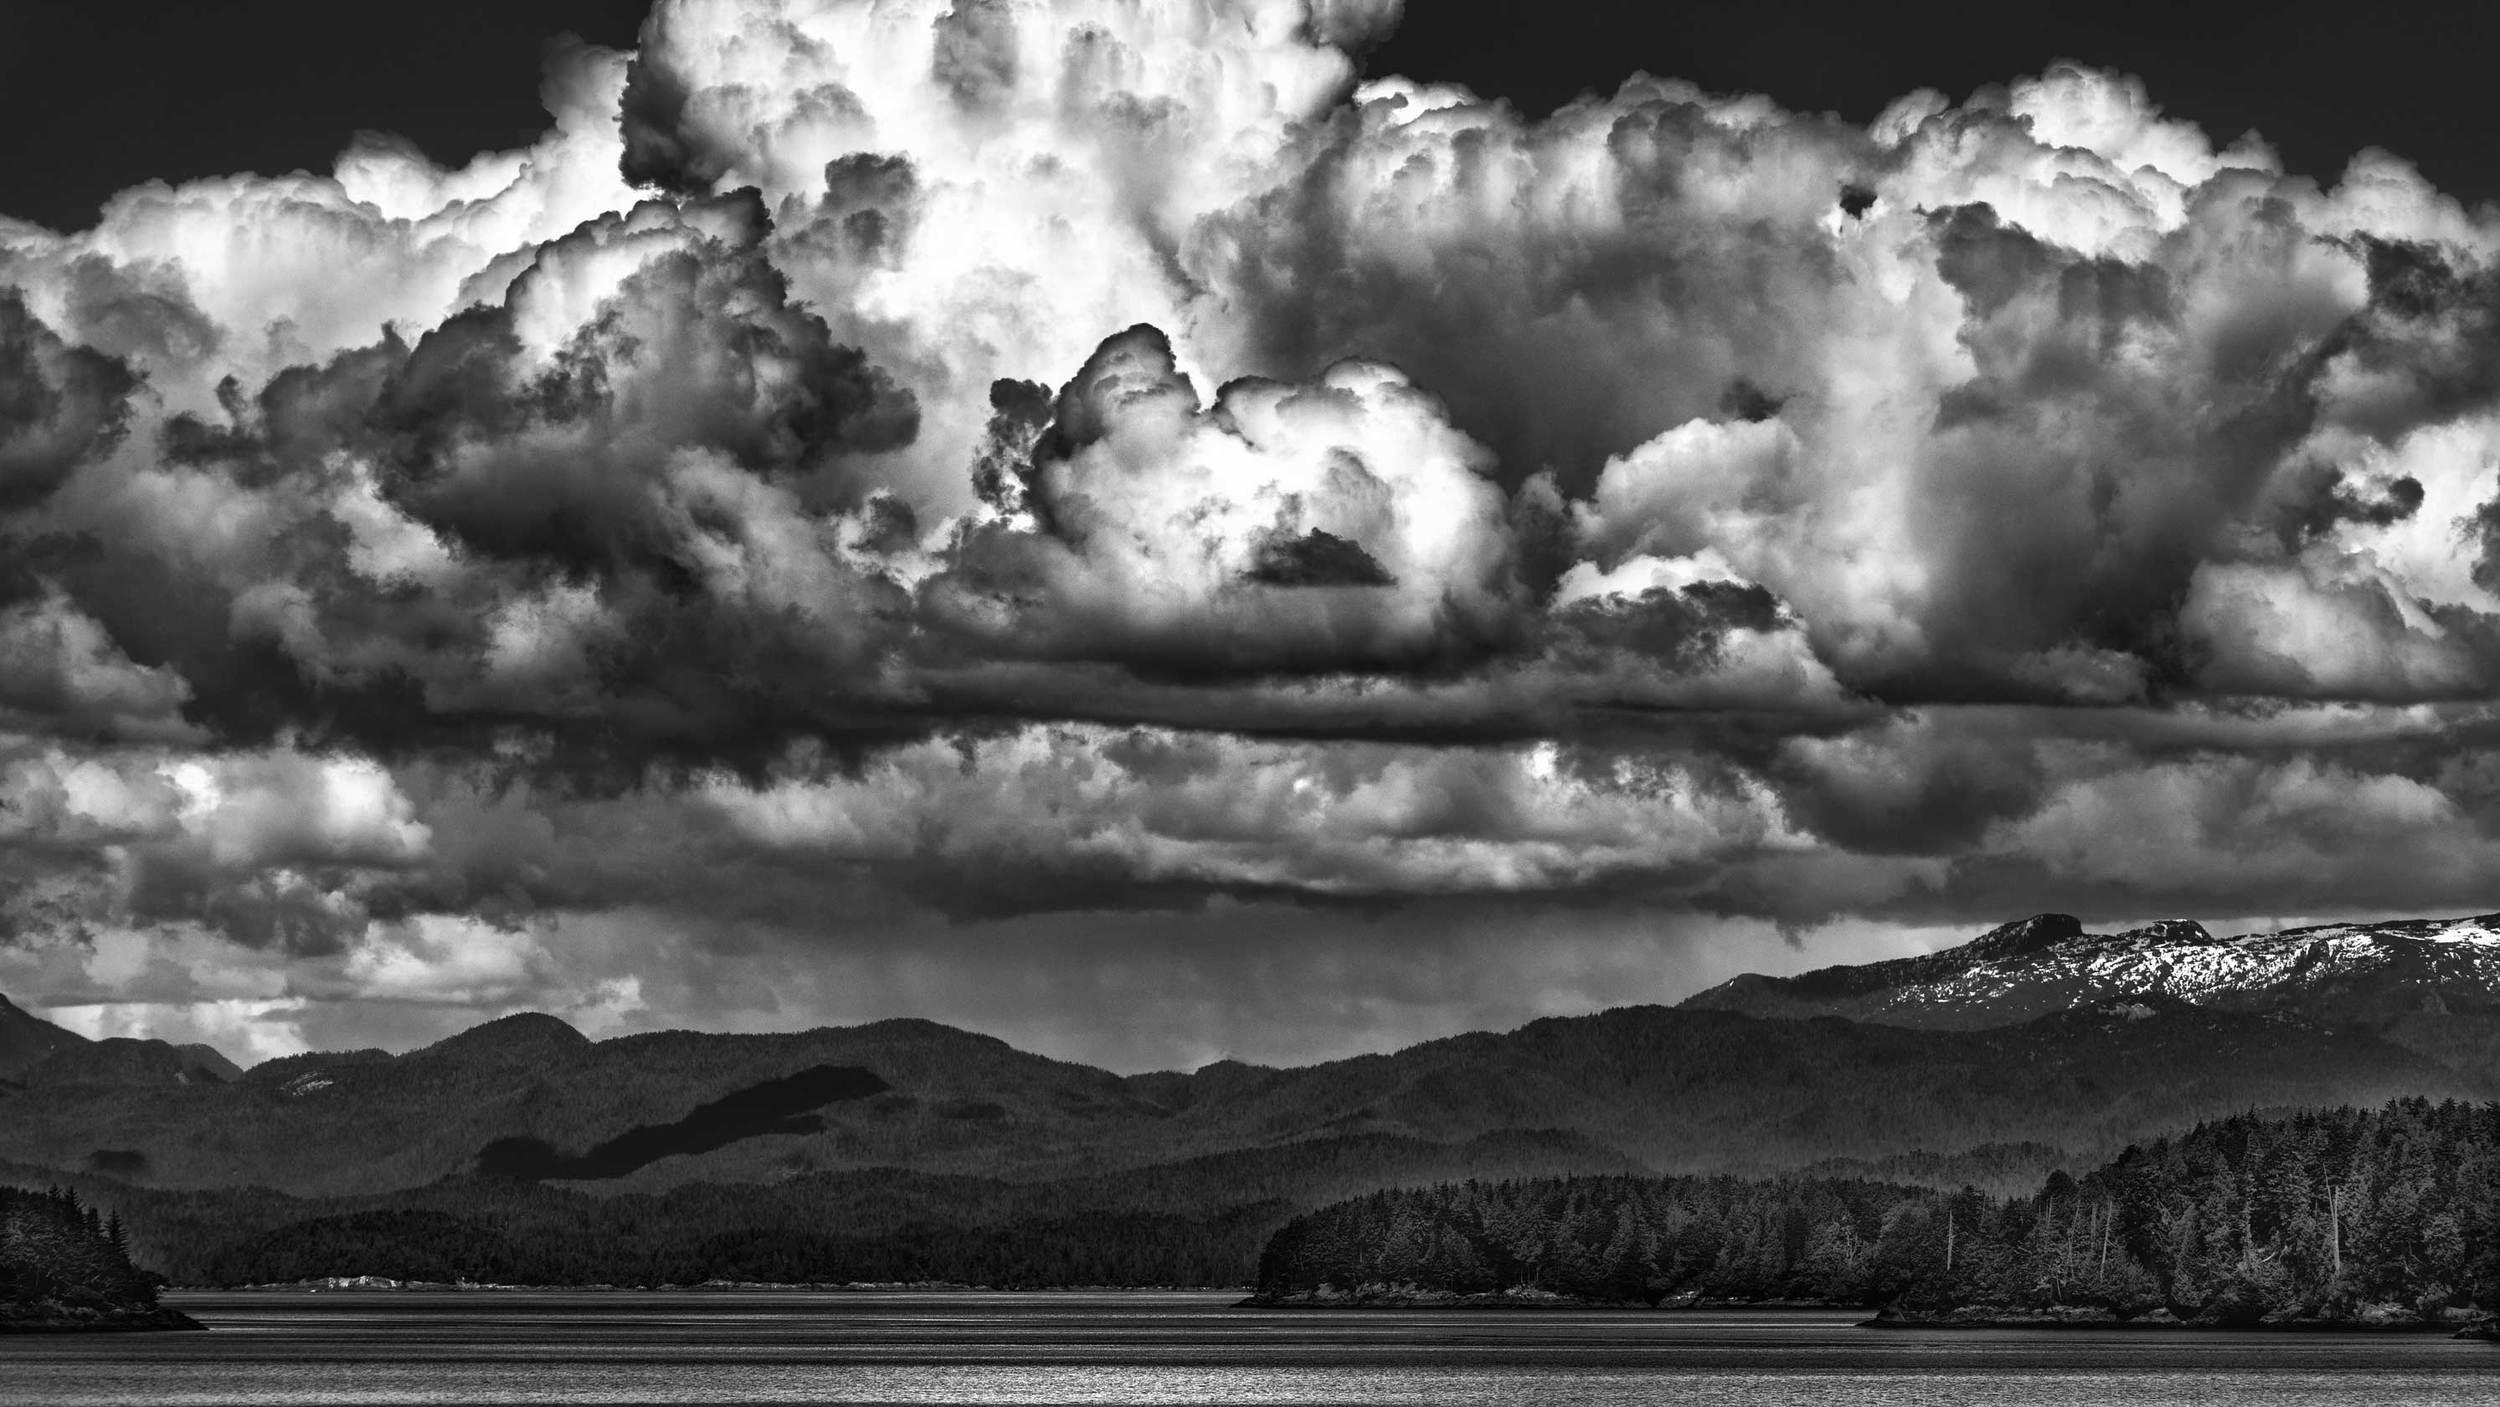 A thunderstorm brewing over the islands of coastal Alaska